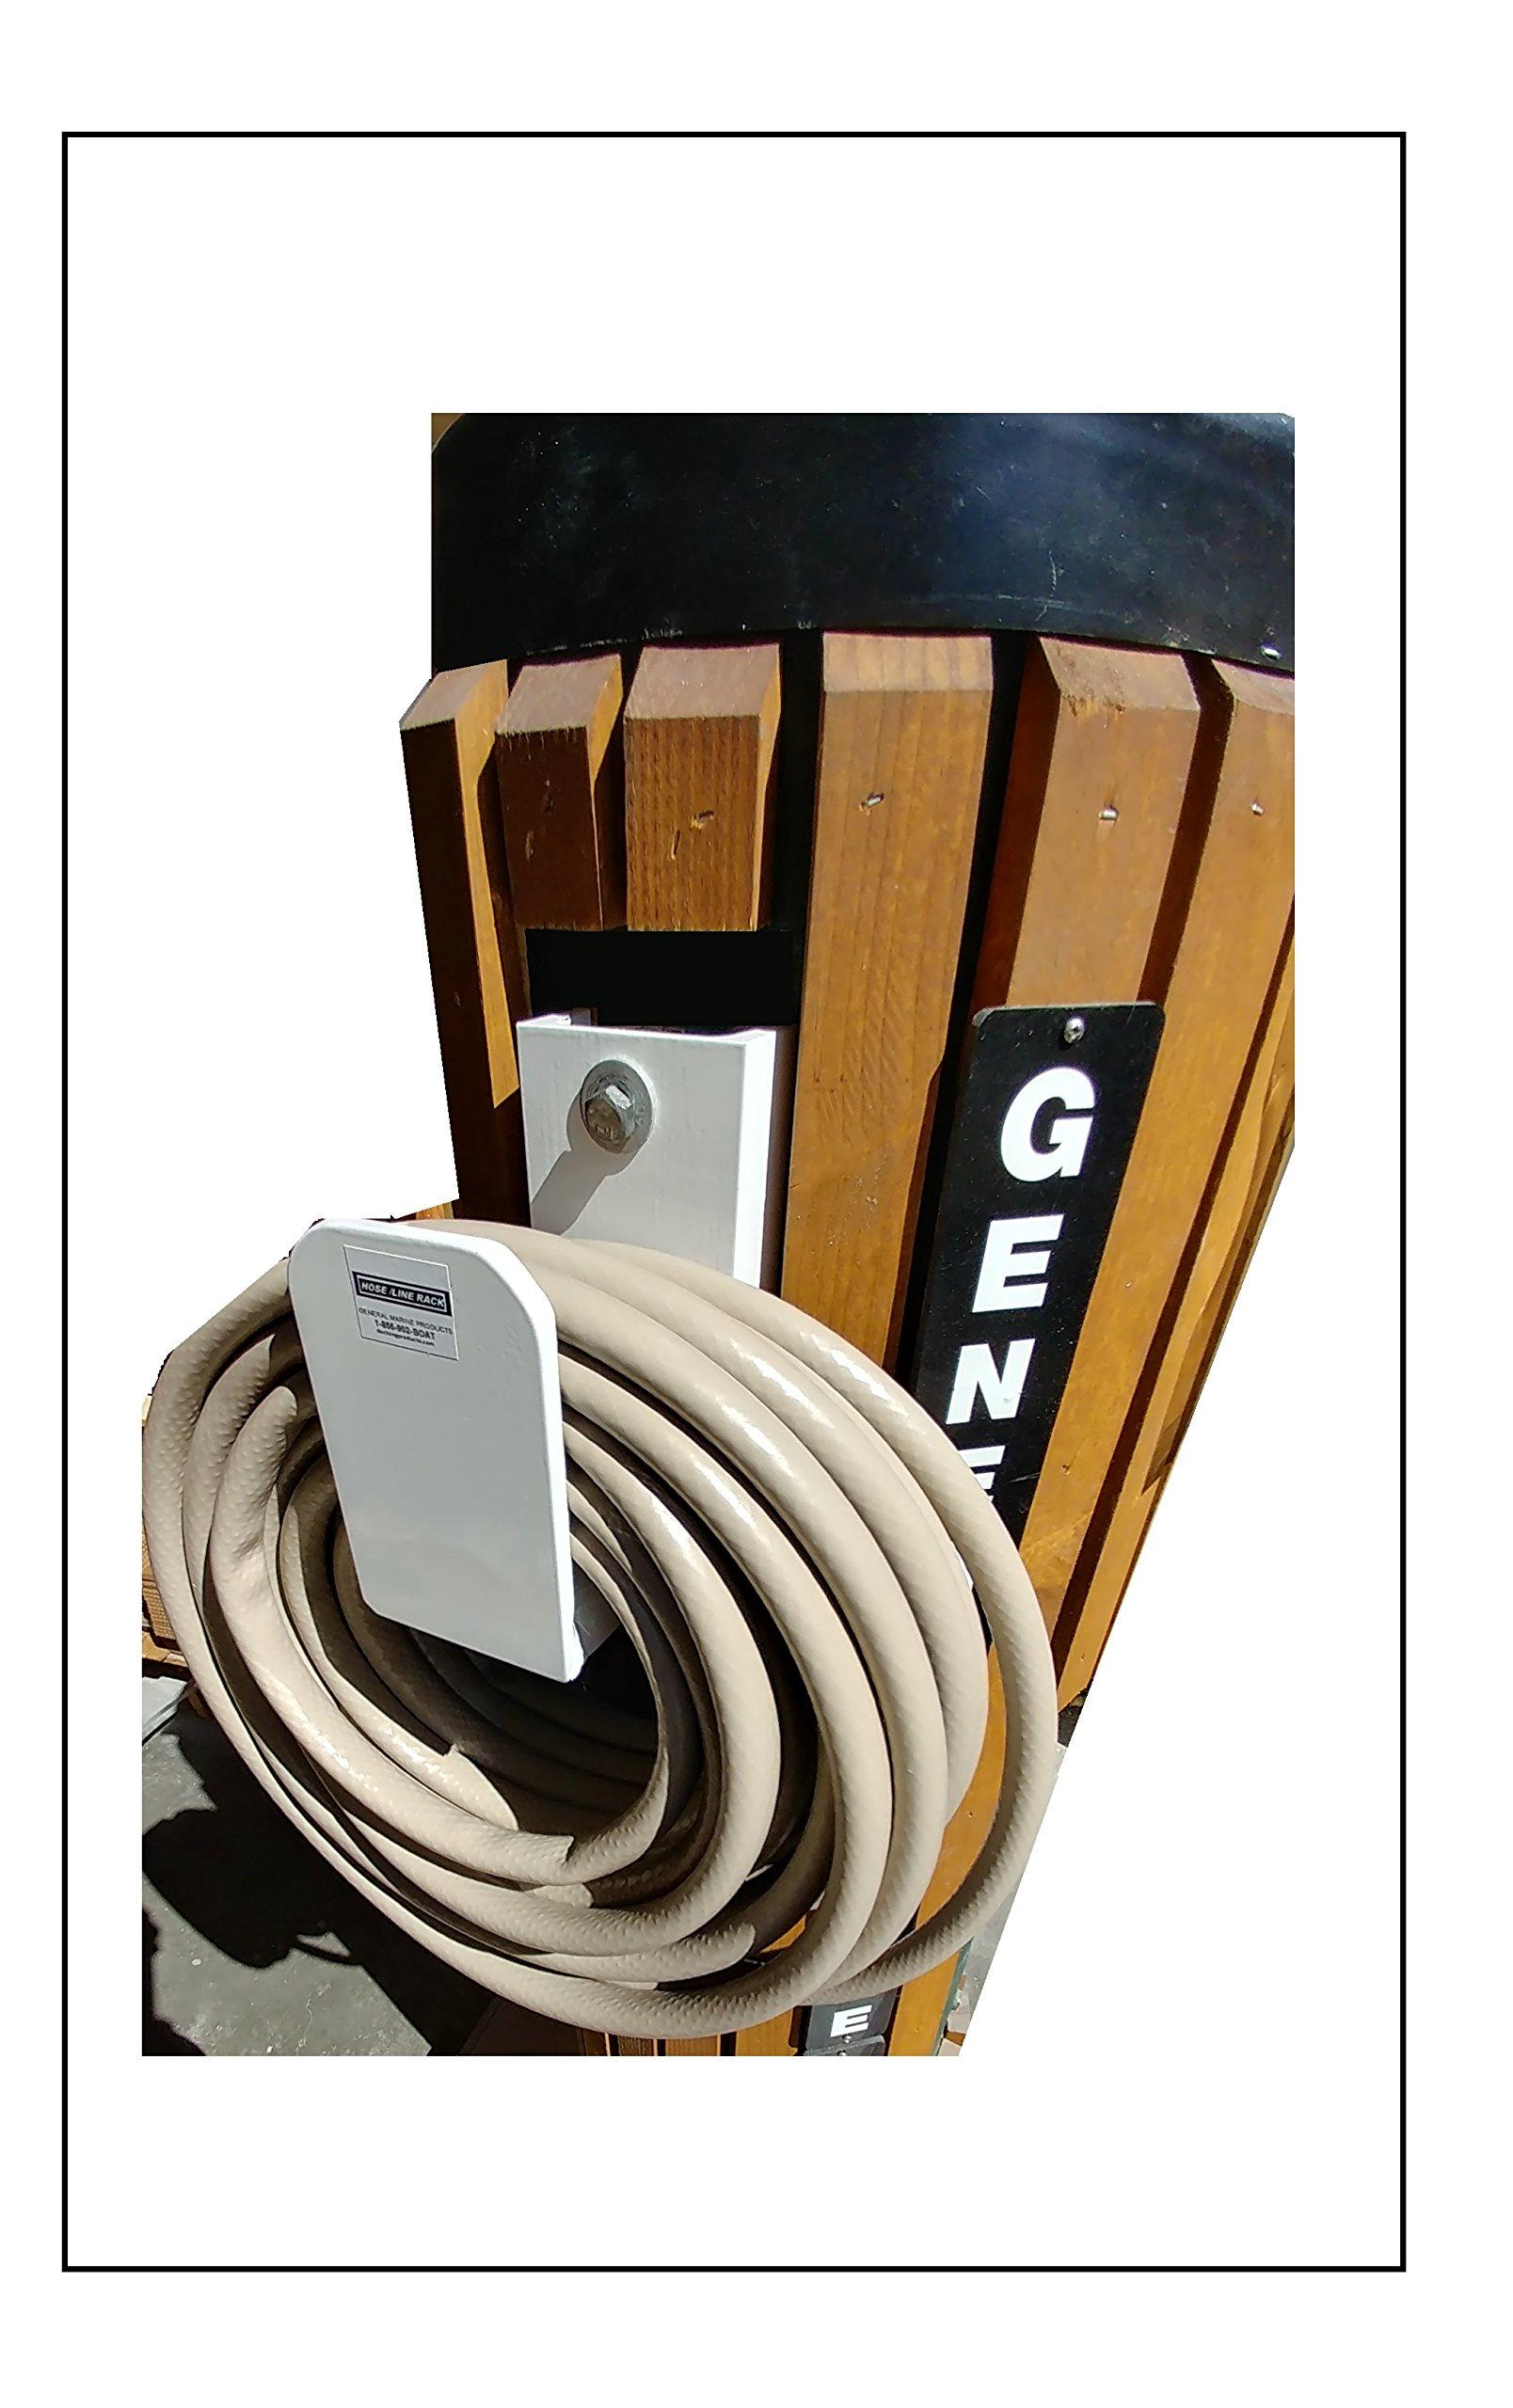 General Marine Products Hose holder wall mounted aluminum powder coated.